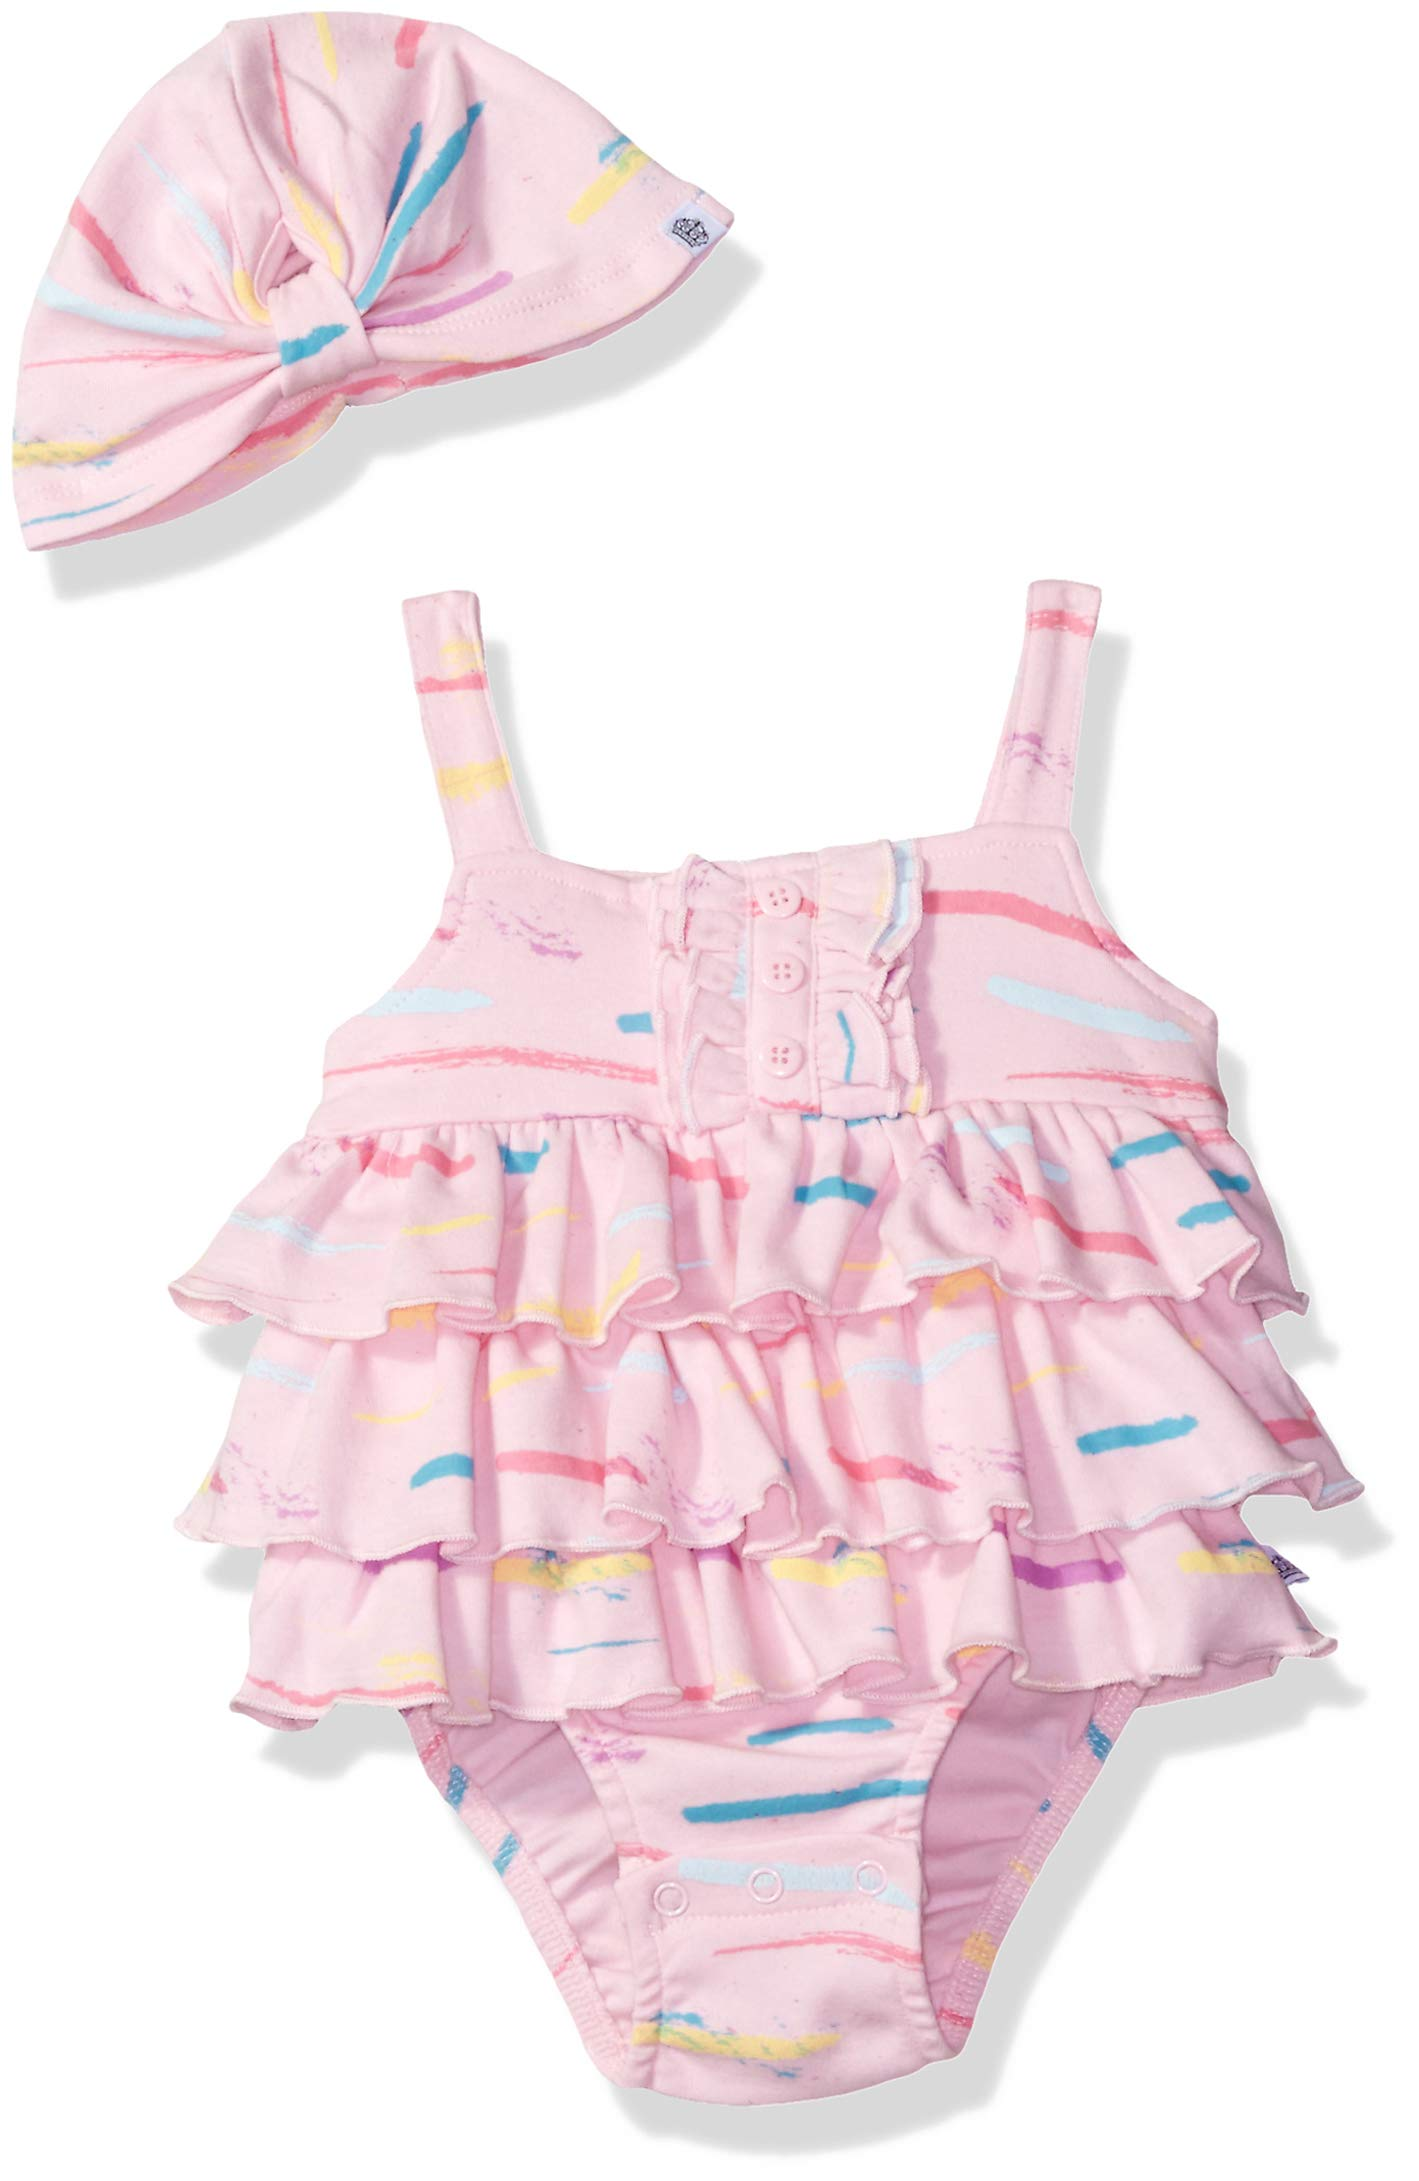 Rosie Pope Baby Girls' Dress Sets